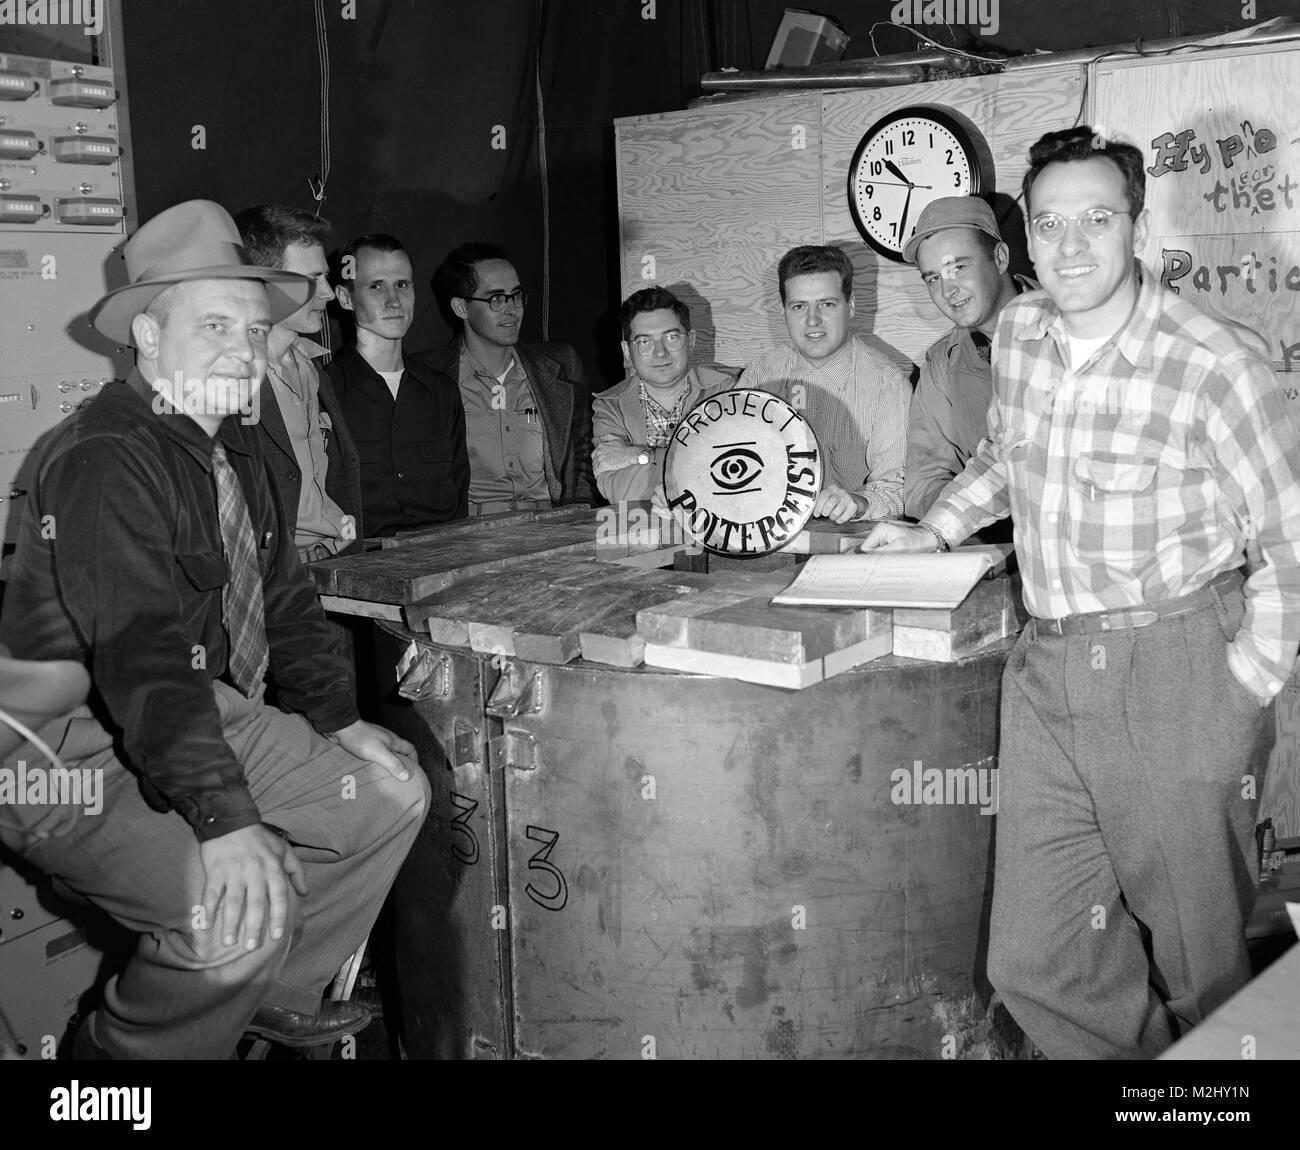 Cowan-Reines Neutrino Experiment, 1953 - Stock Image